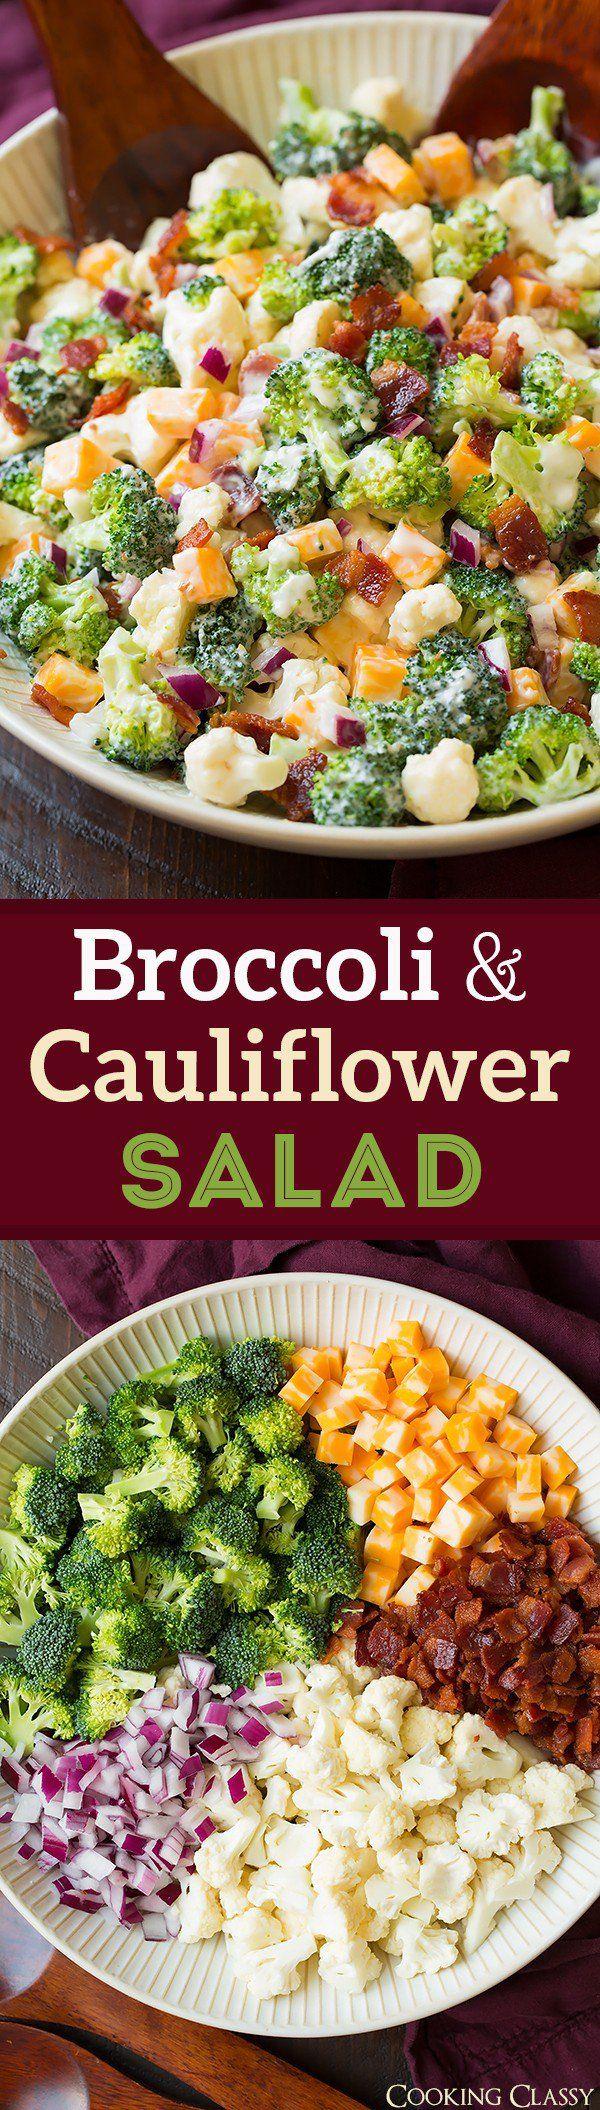 Get the recipe ♥ Broccoli Cauliflower Salad #besttoeat #recipes_to_go